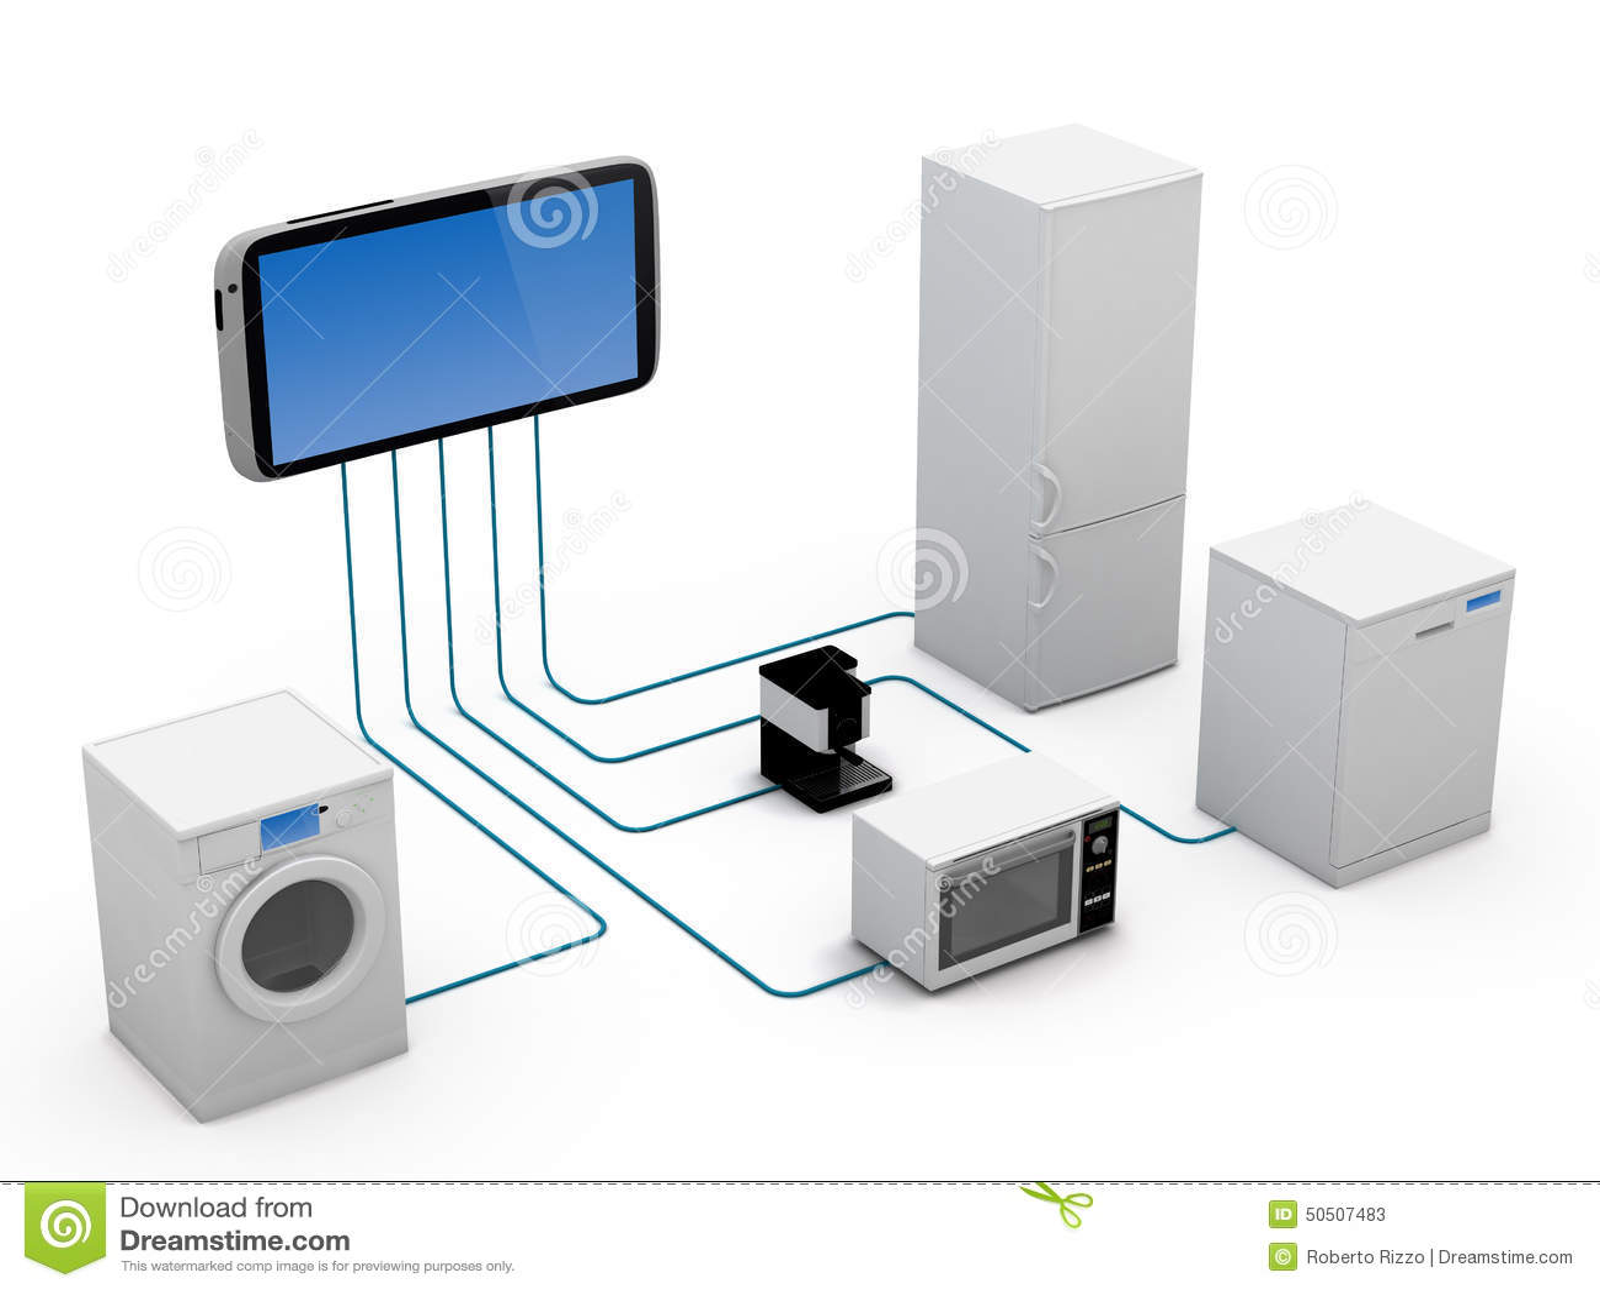 internet of things concept stock illustration image 50507483. Black Bedroom Furniture Sets. Home Design Ideas